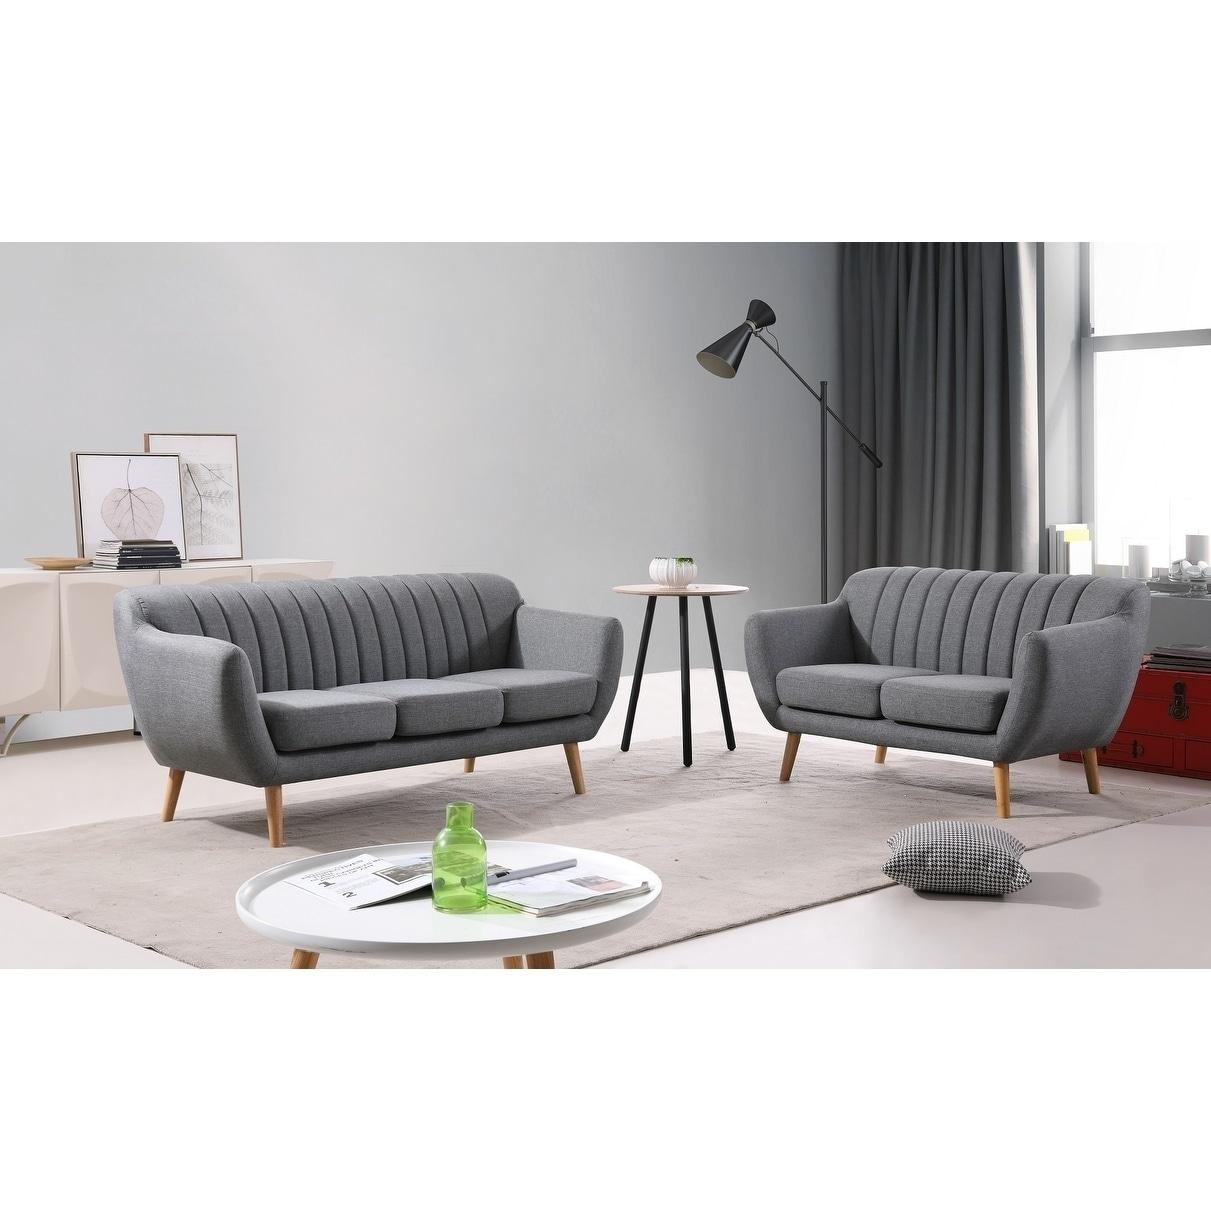 Carson Carrington Daloya Modern Sofa and Loveseat Set